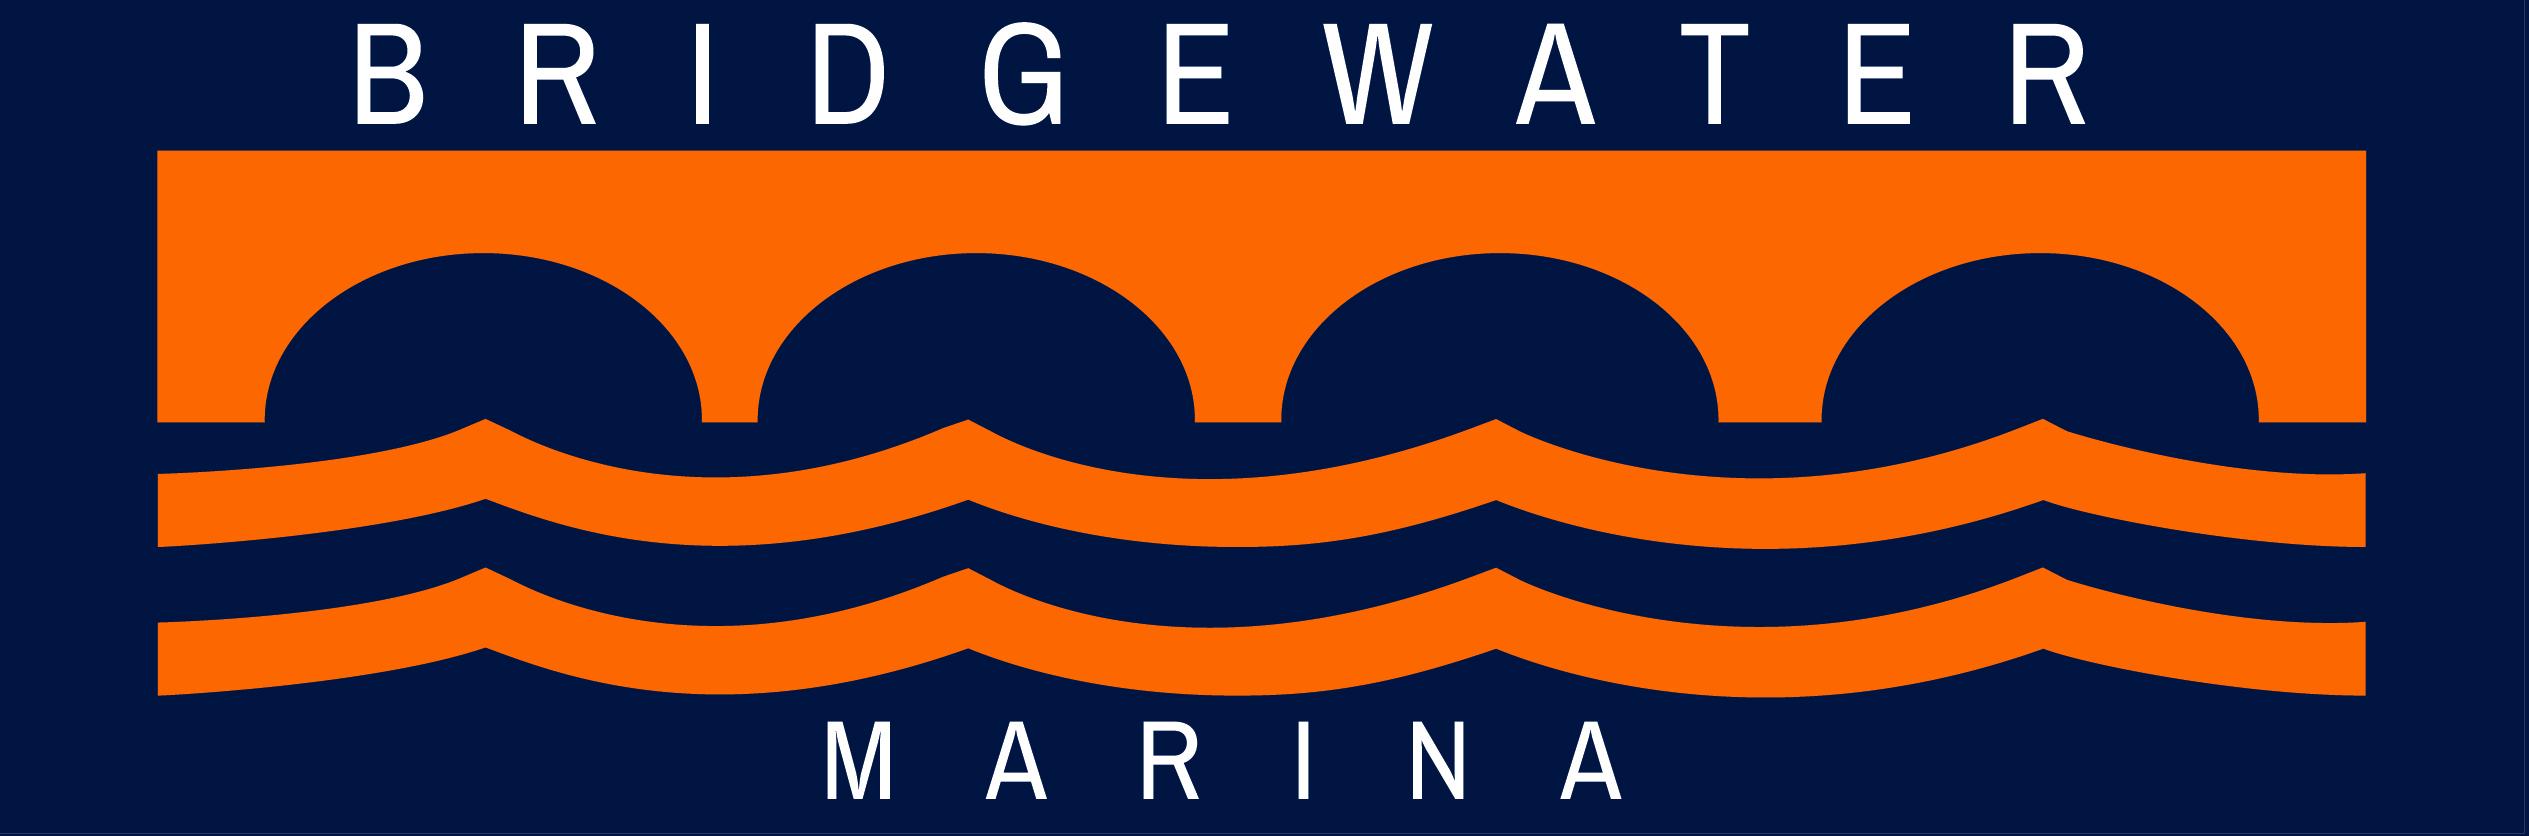 Bridgewater Marina and Boat Rentals